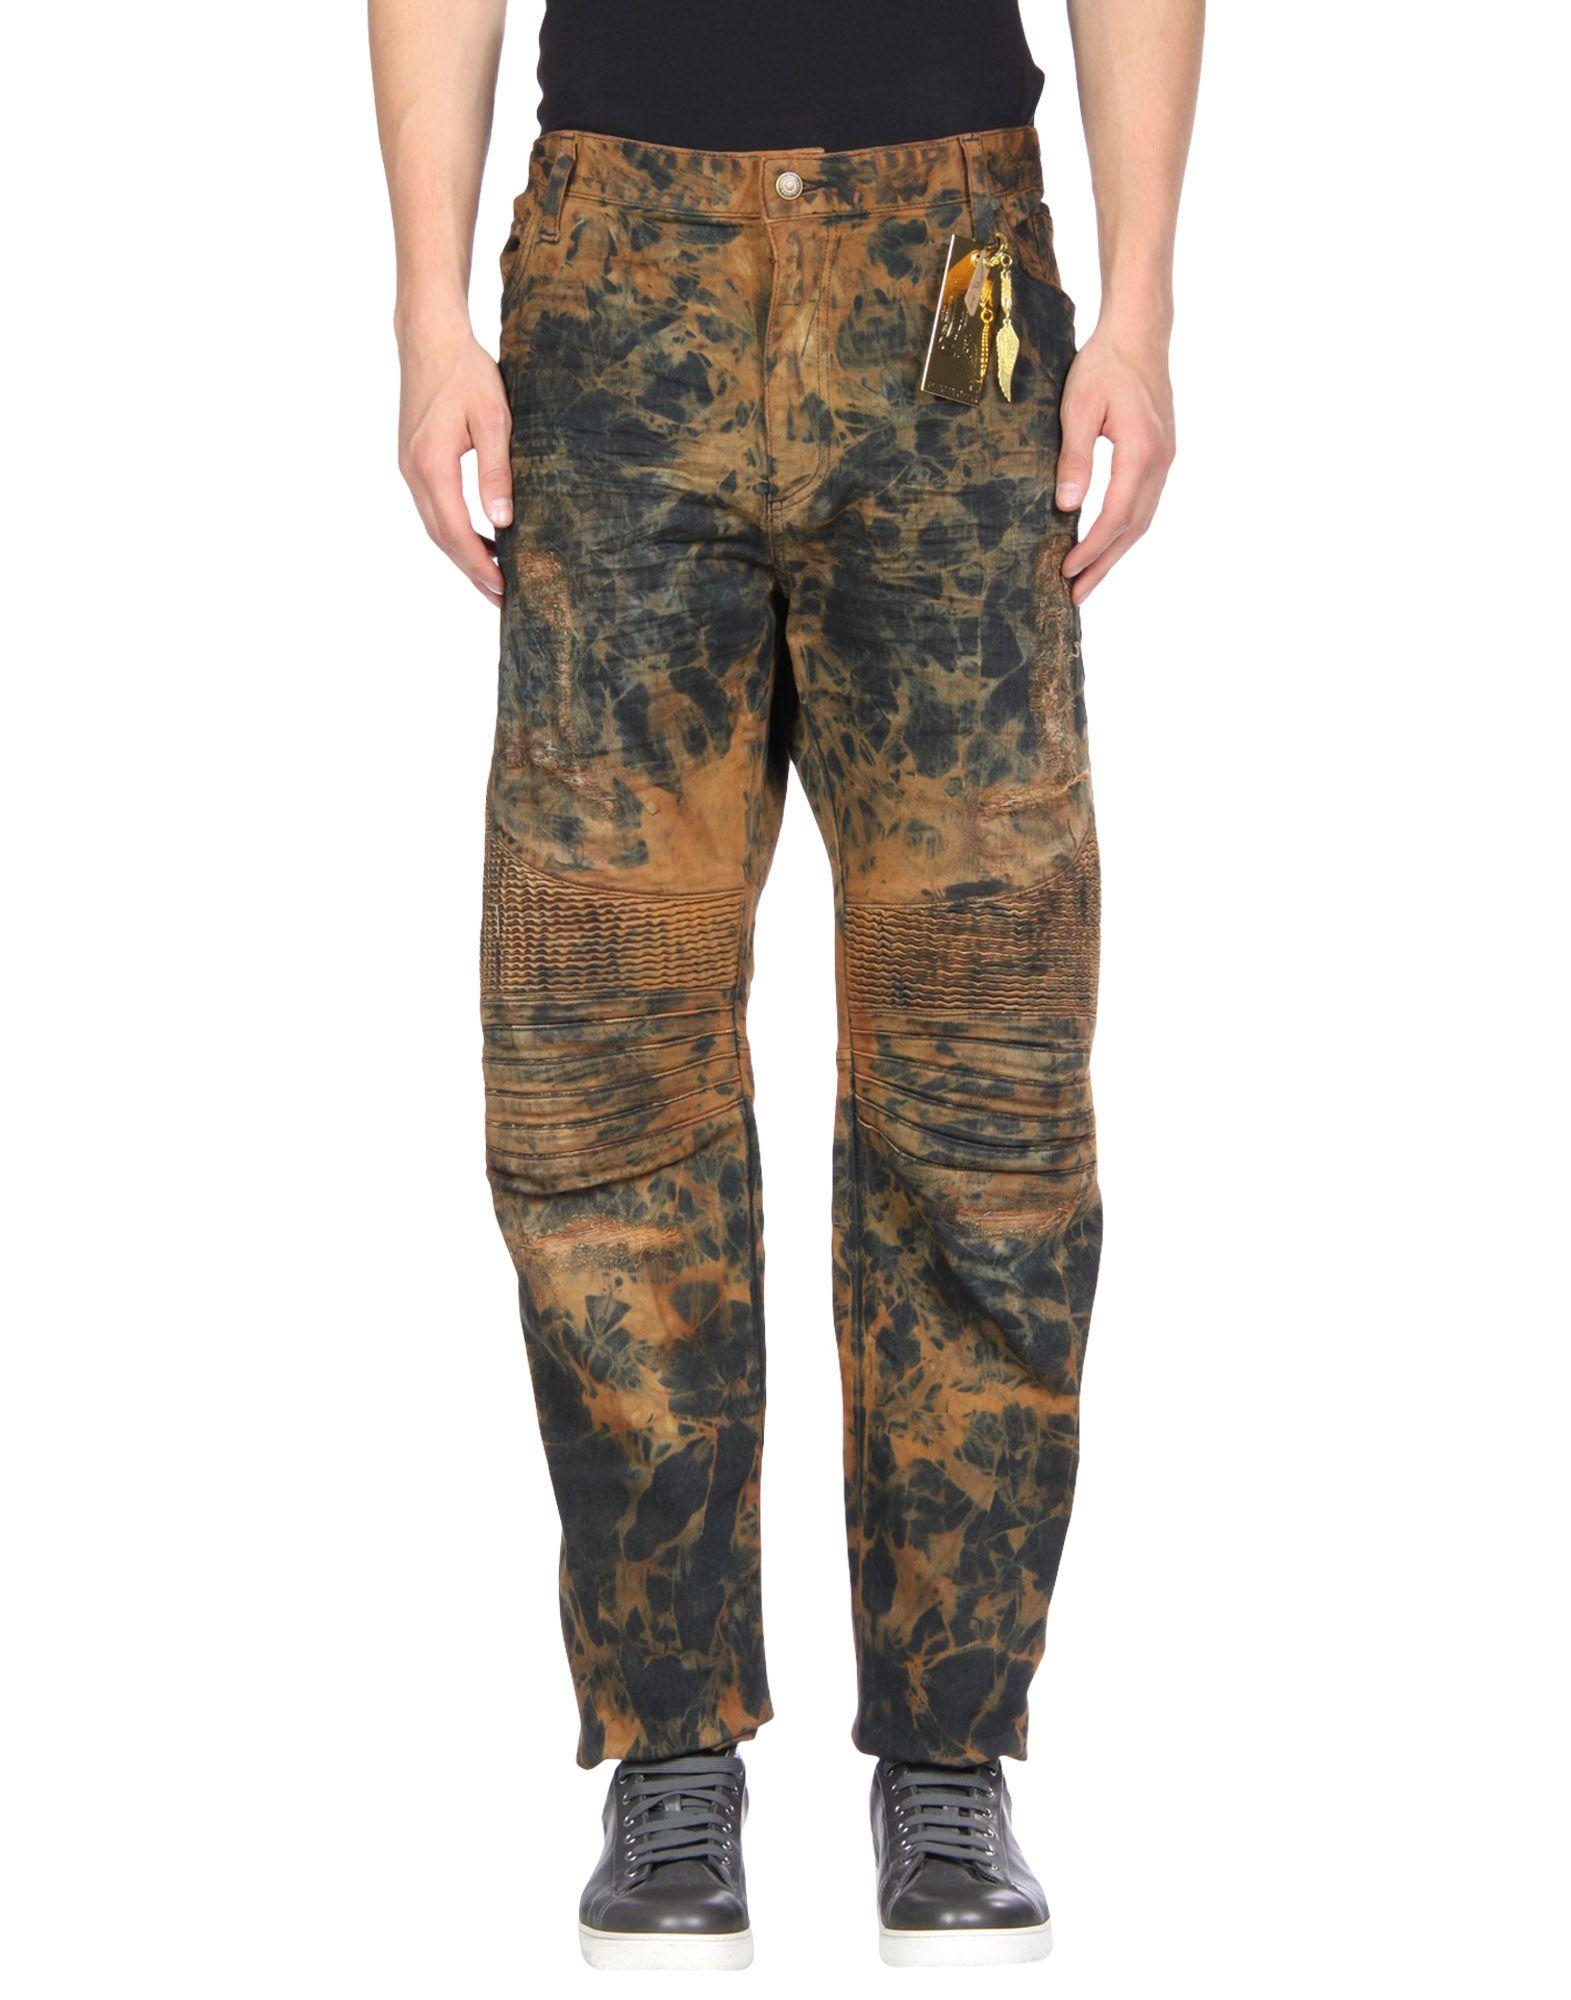 ROBIN'S JEAN Jeans in Brown